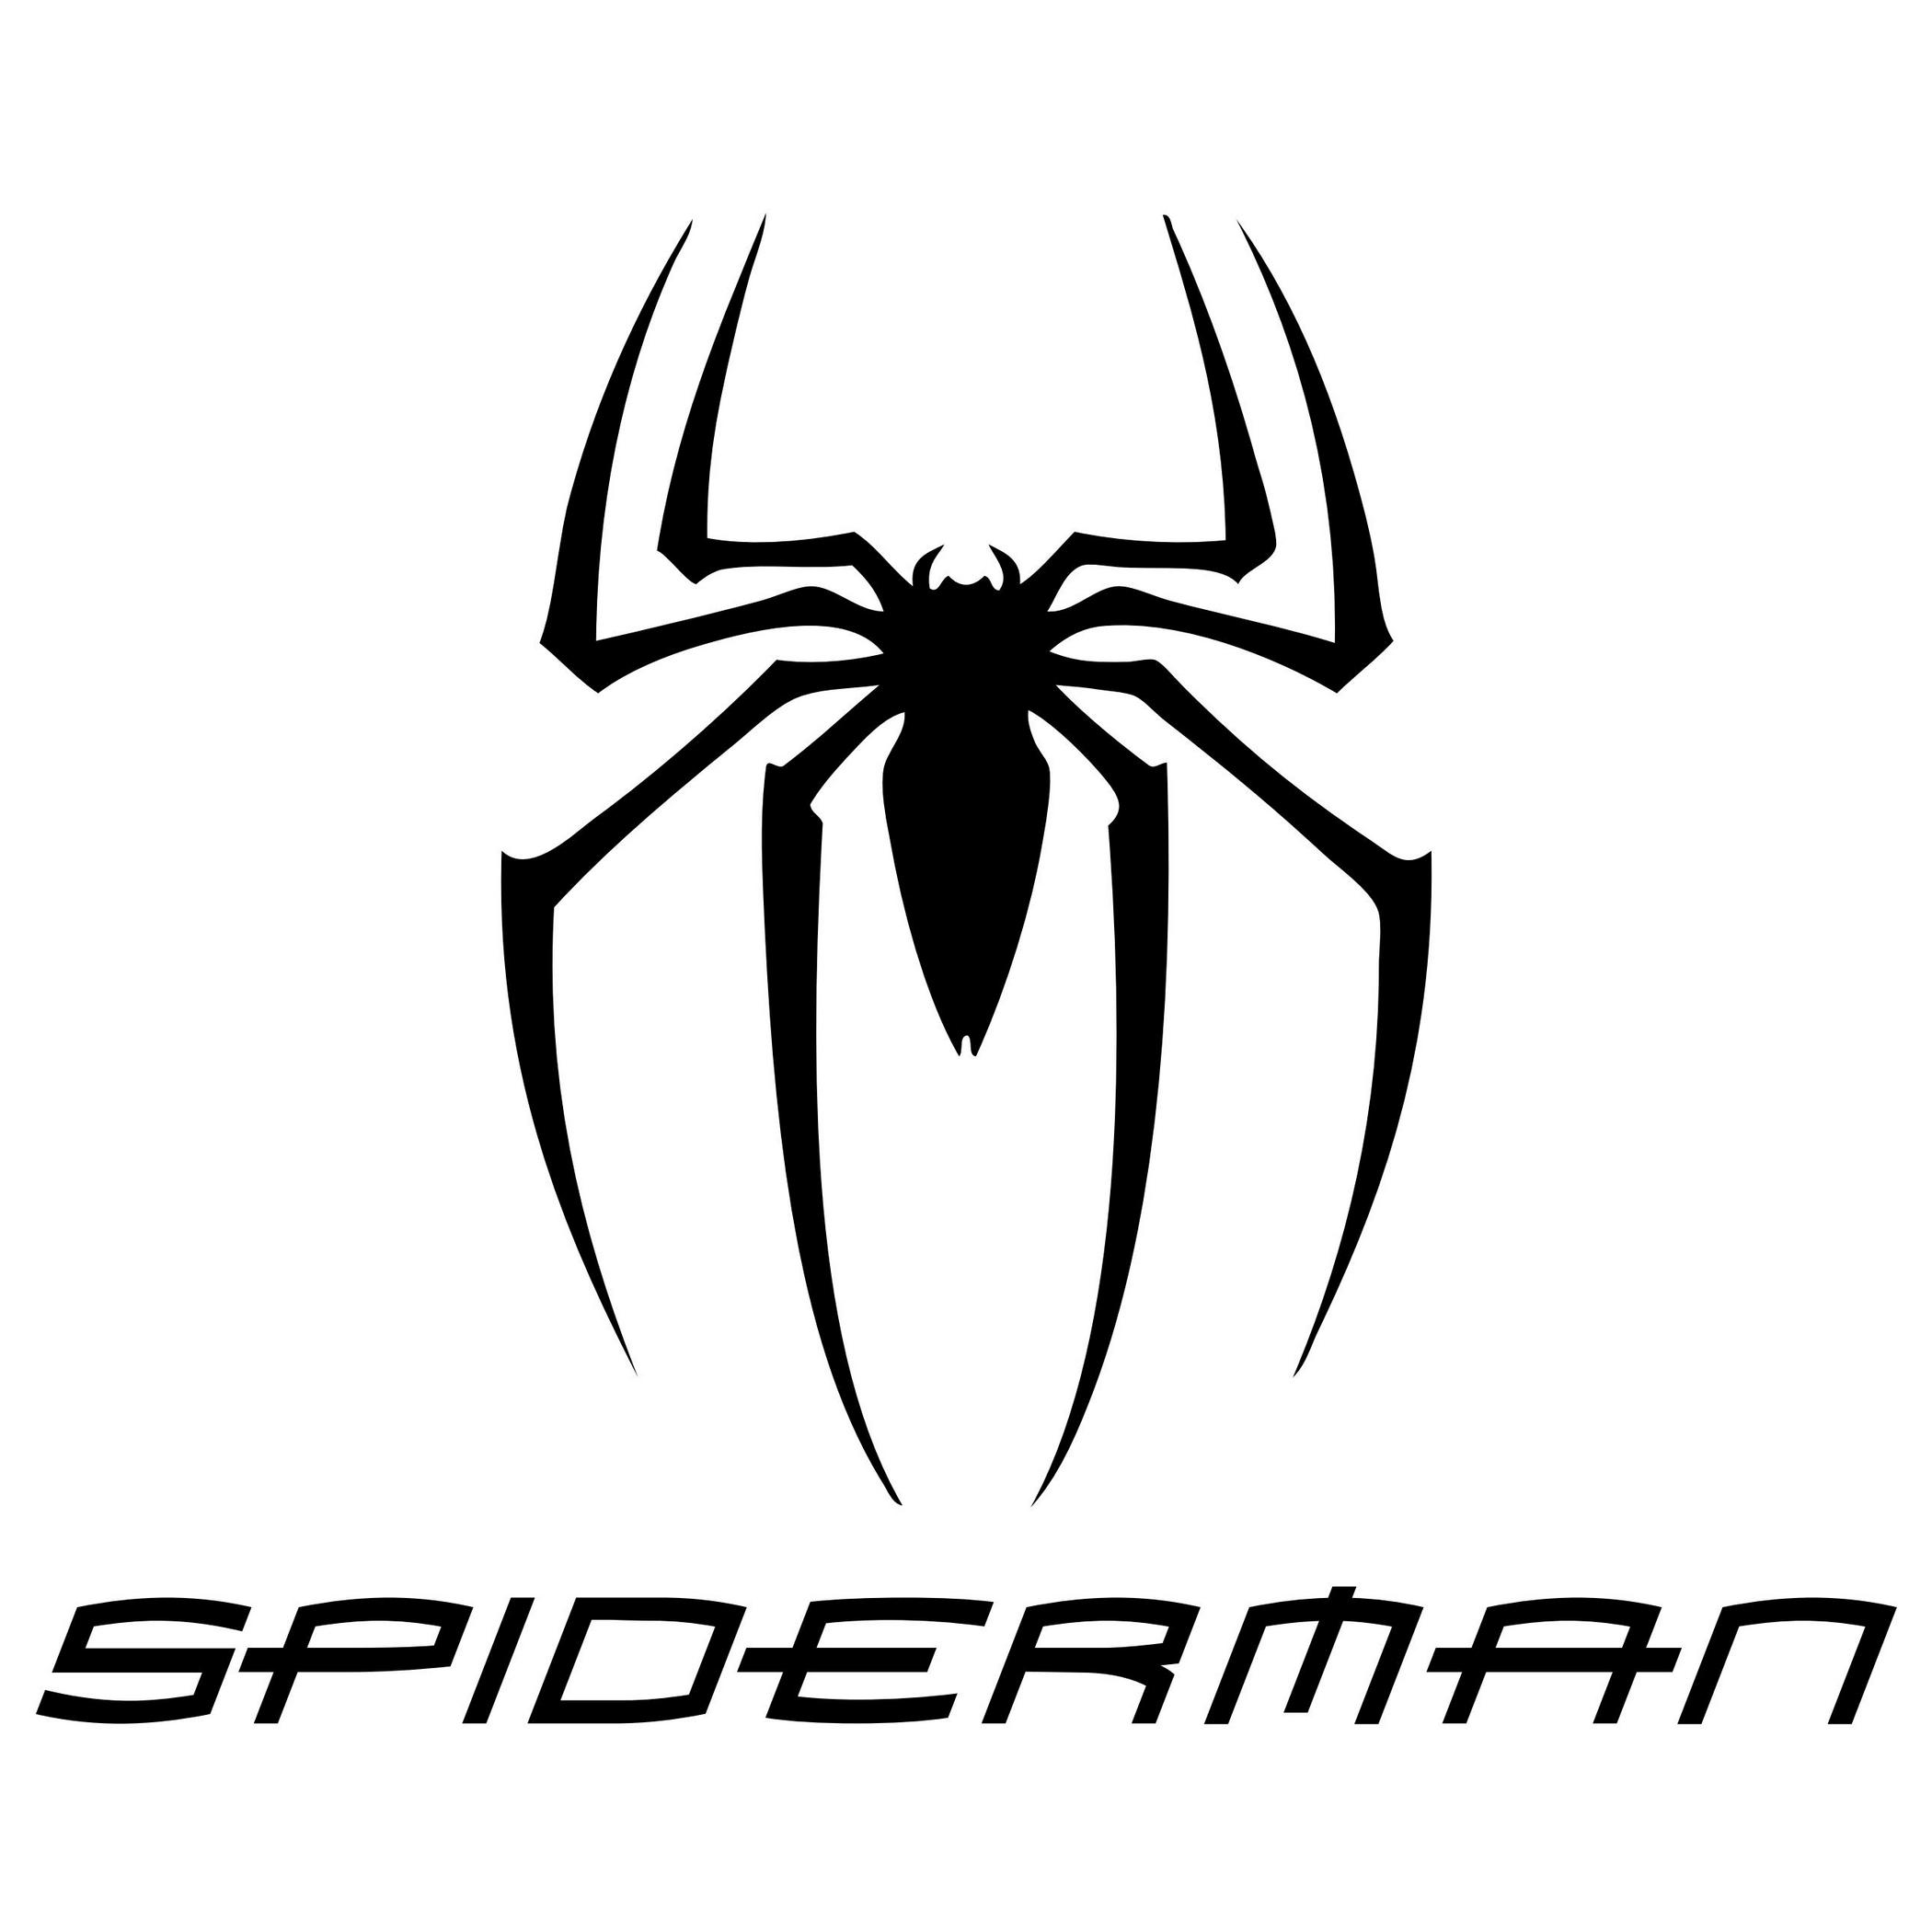 Spiderman clipart emblem Stenciling Man Pinterest Spider and